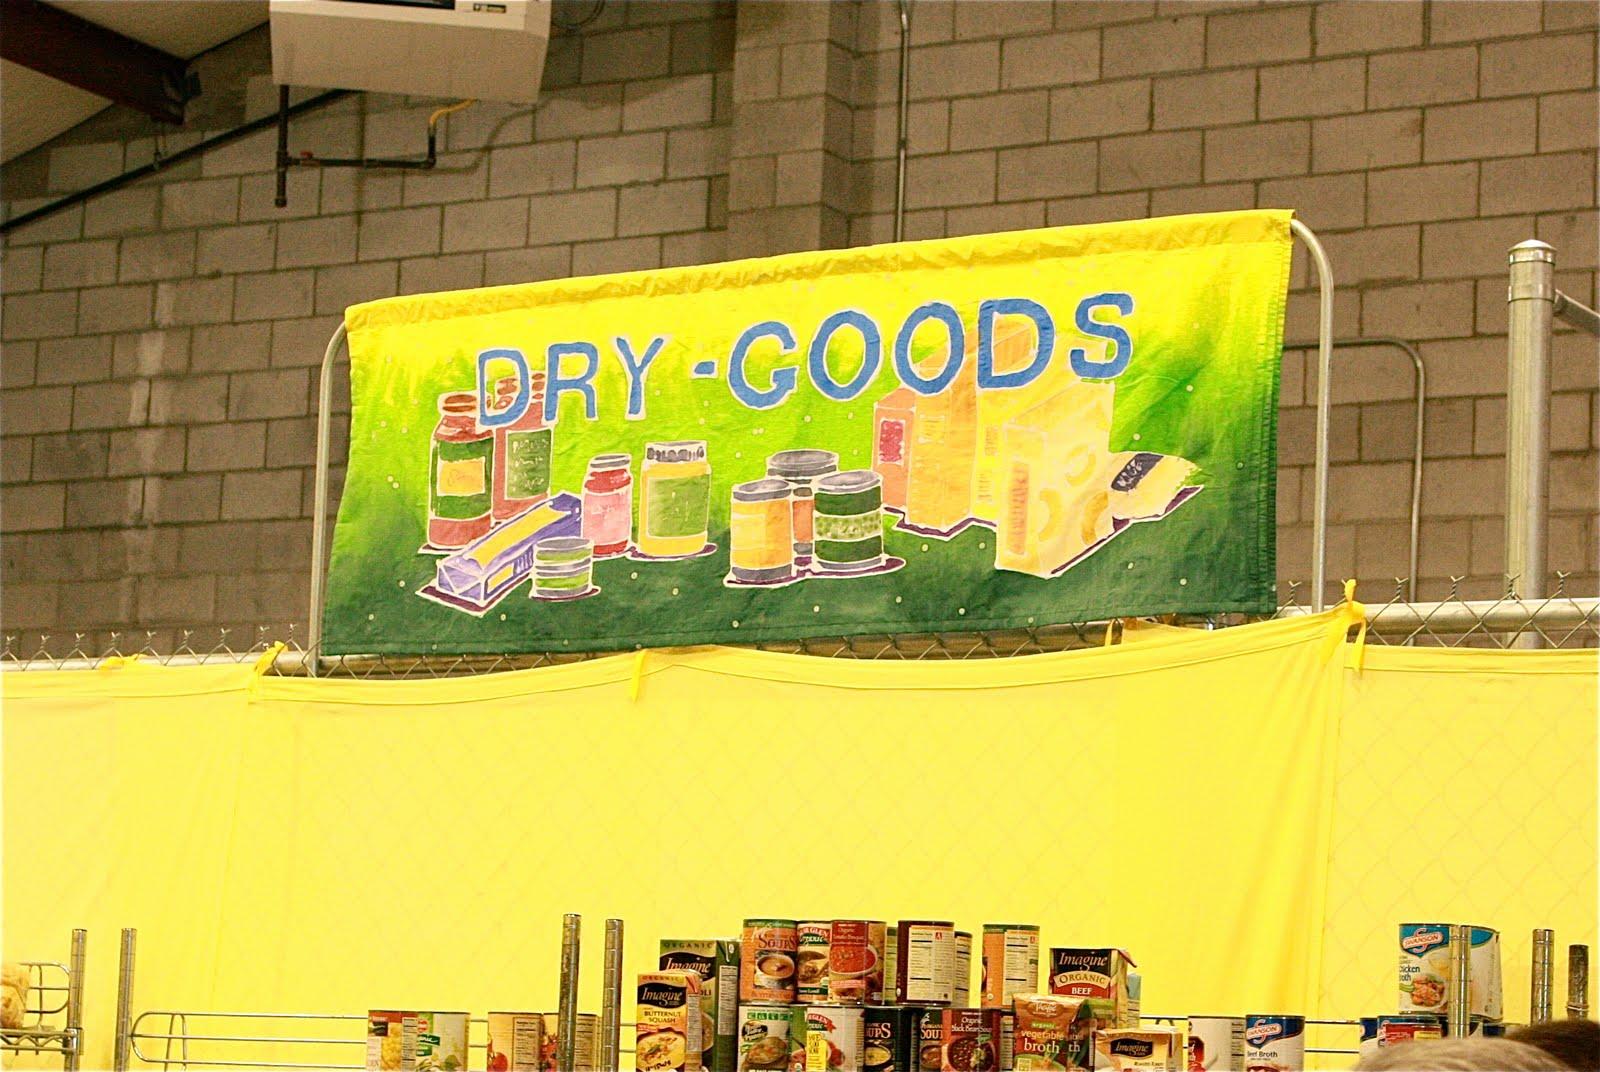 washington food coalition news: meet our members - seattle food